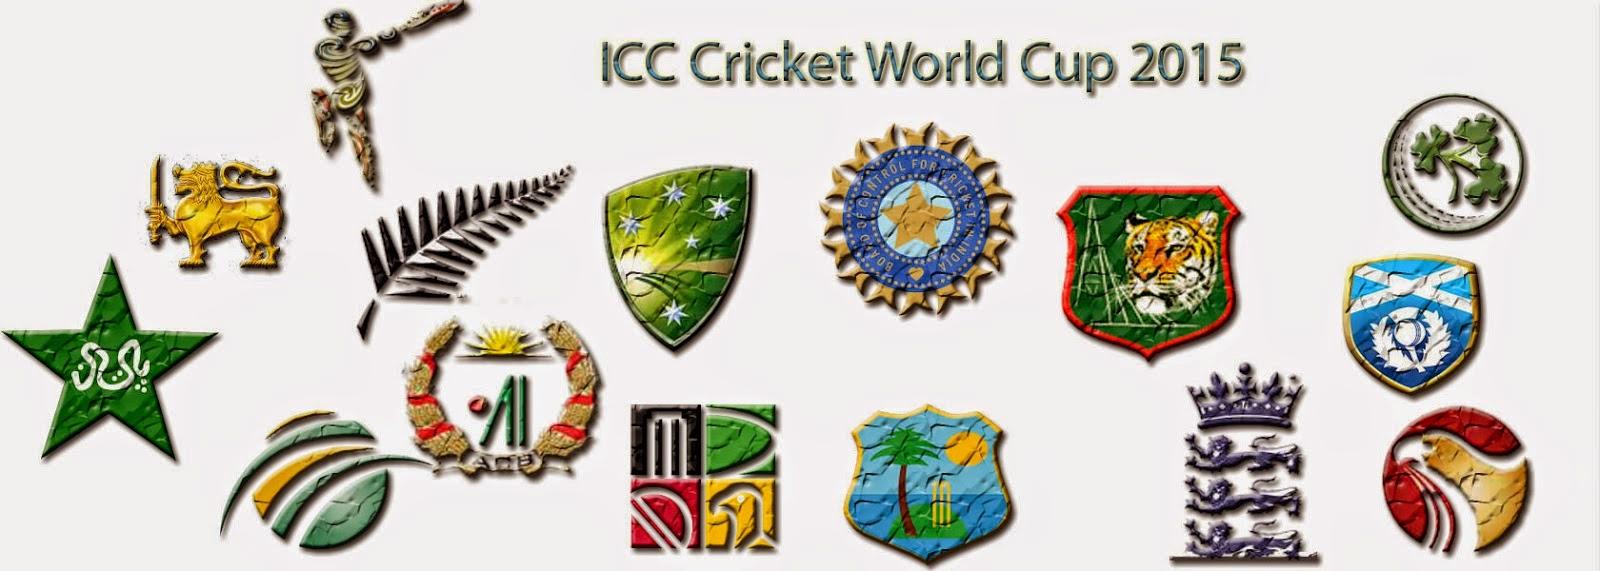 Cricket World Cup 2015 Bangladesh 15 Men Team Squad - IPL 2015 Live ...